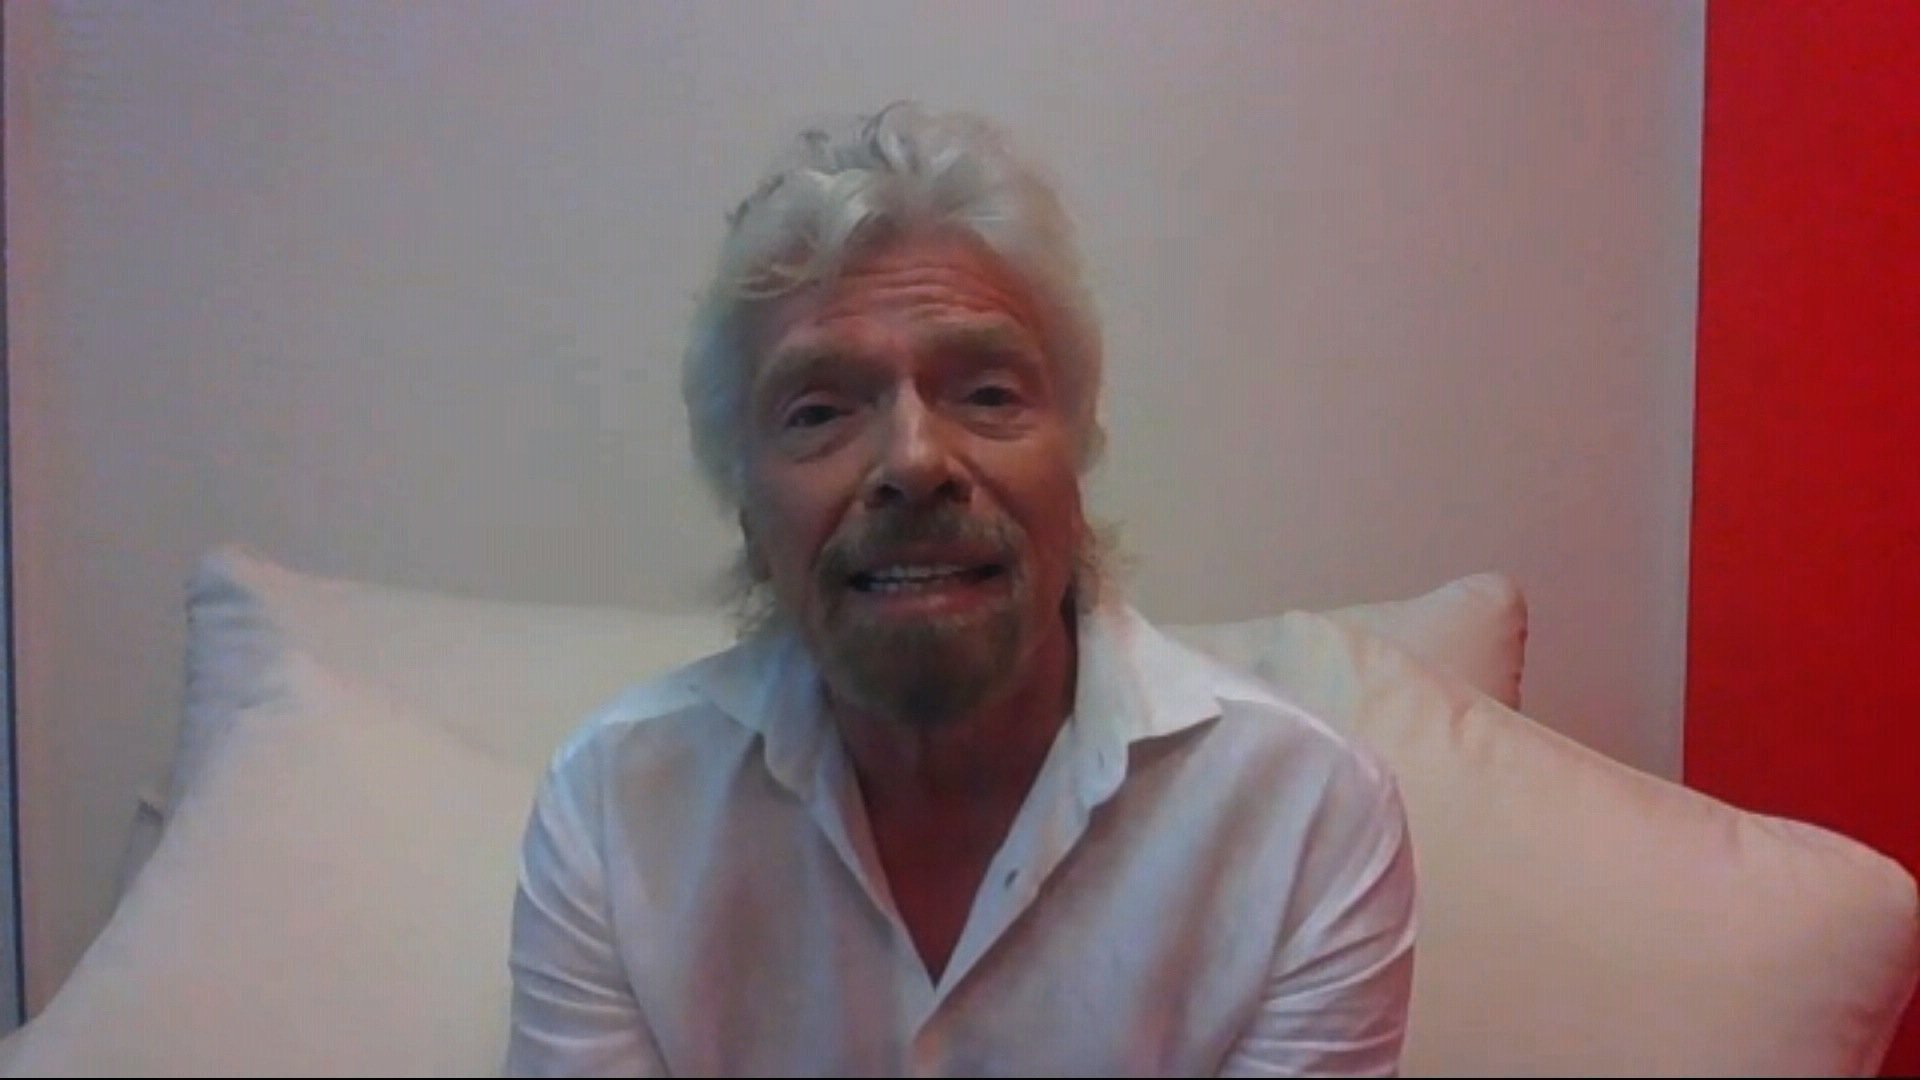 Sir Richard Branson Survives Irma, Says Son